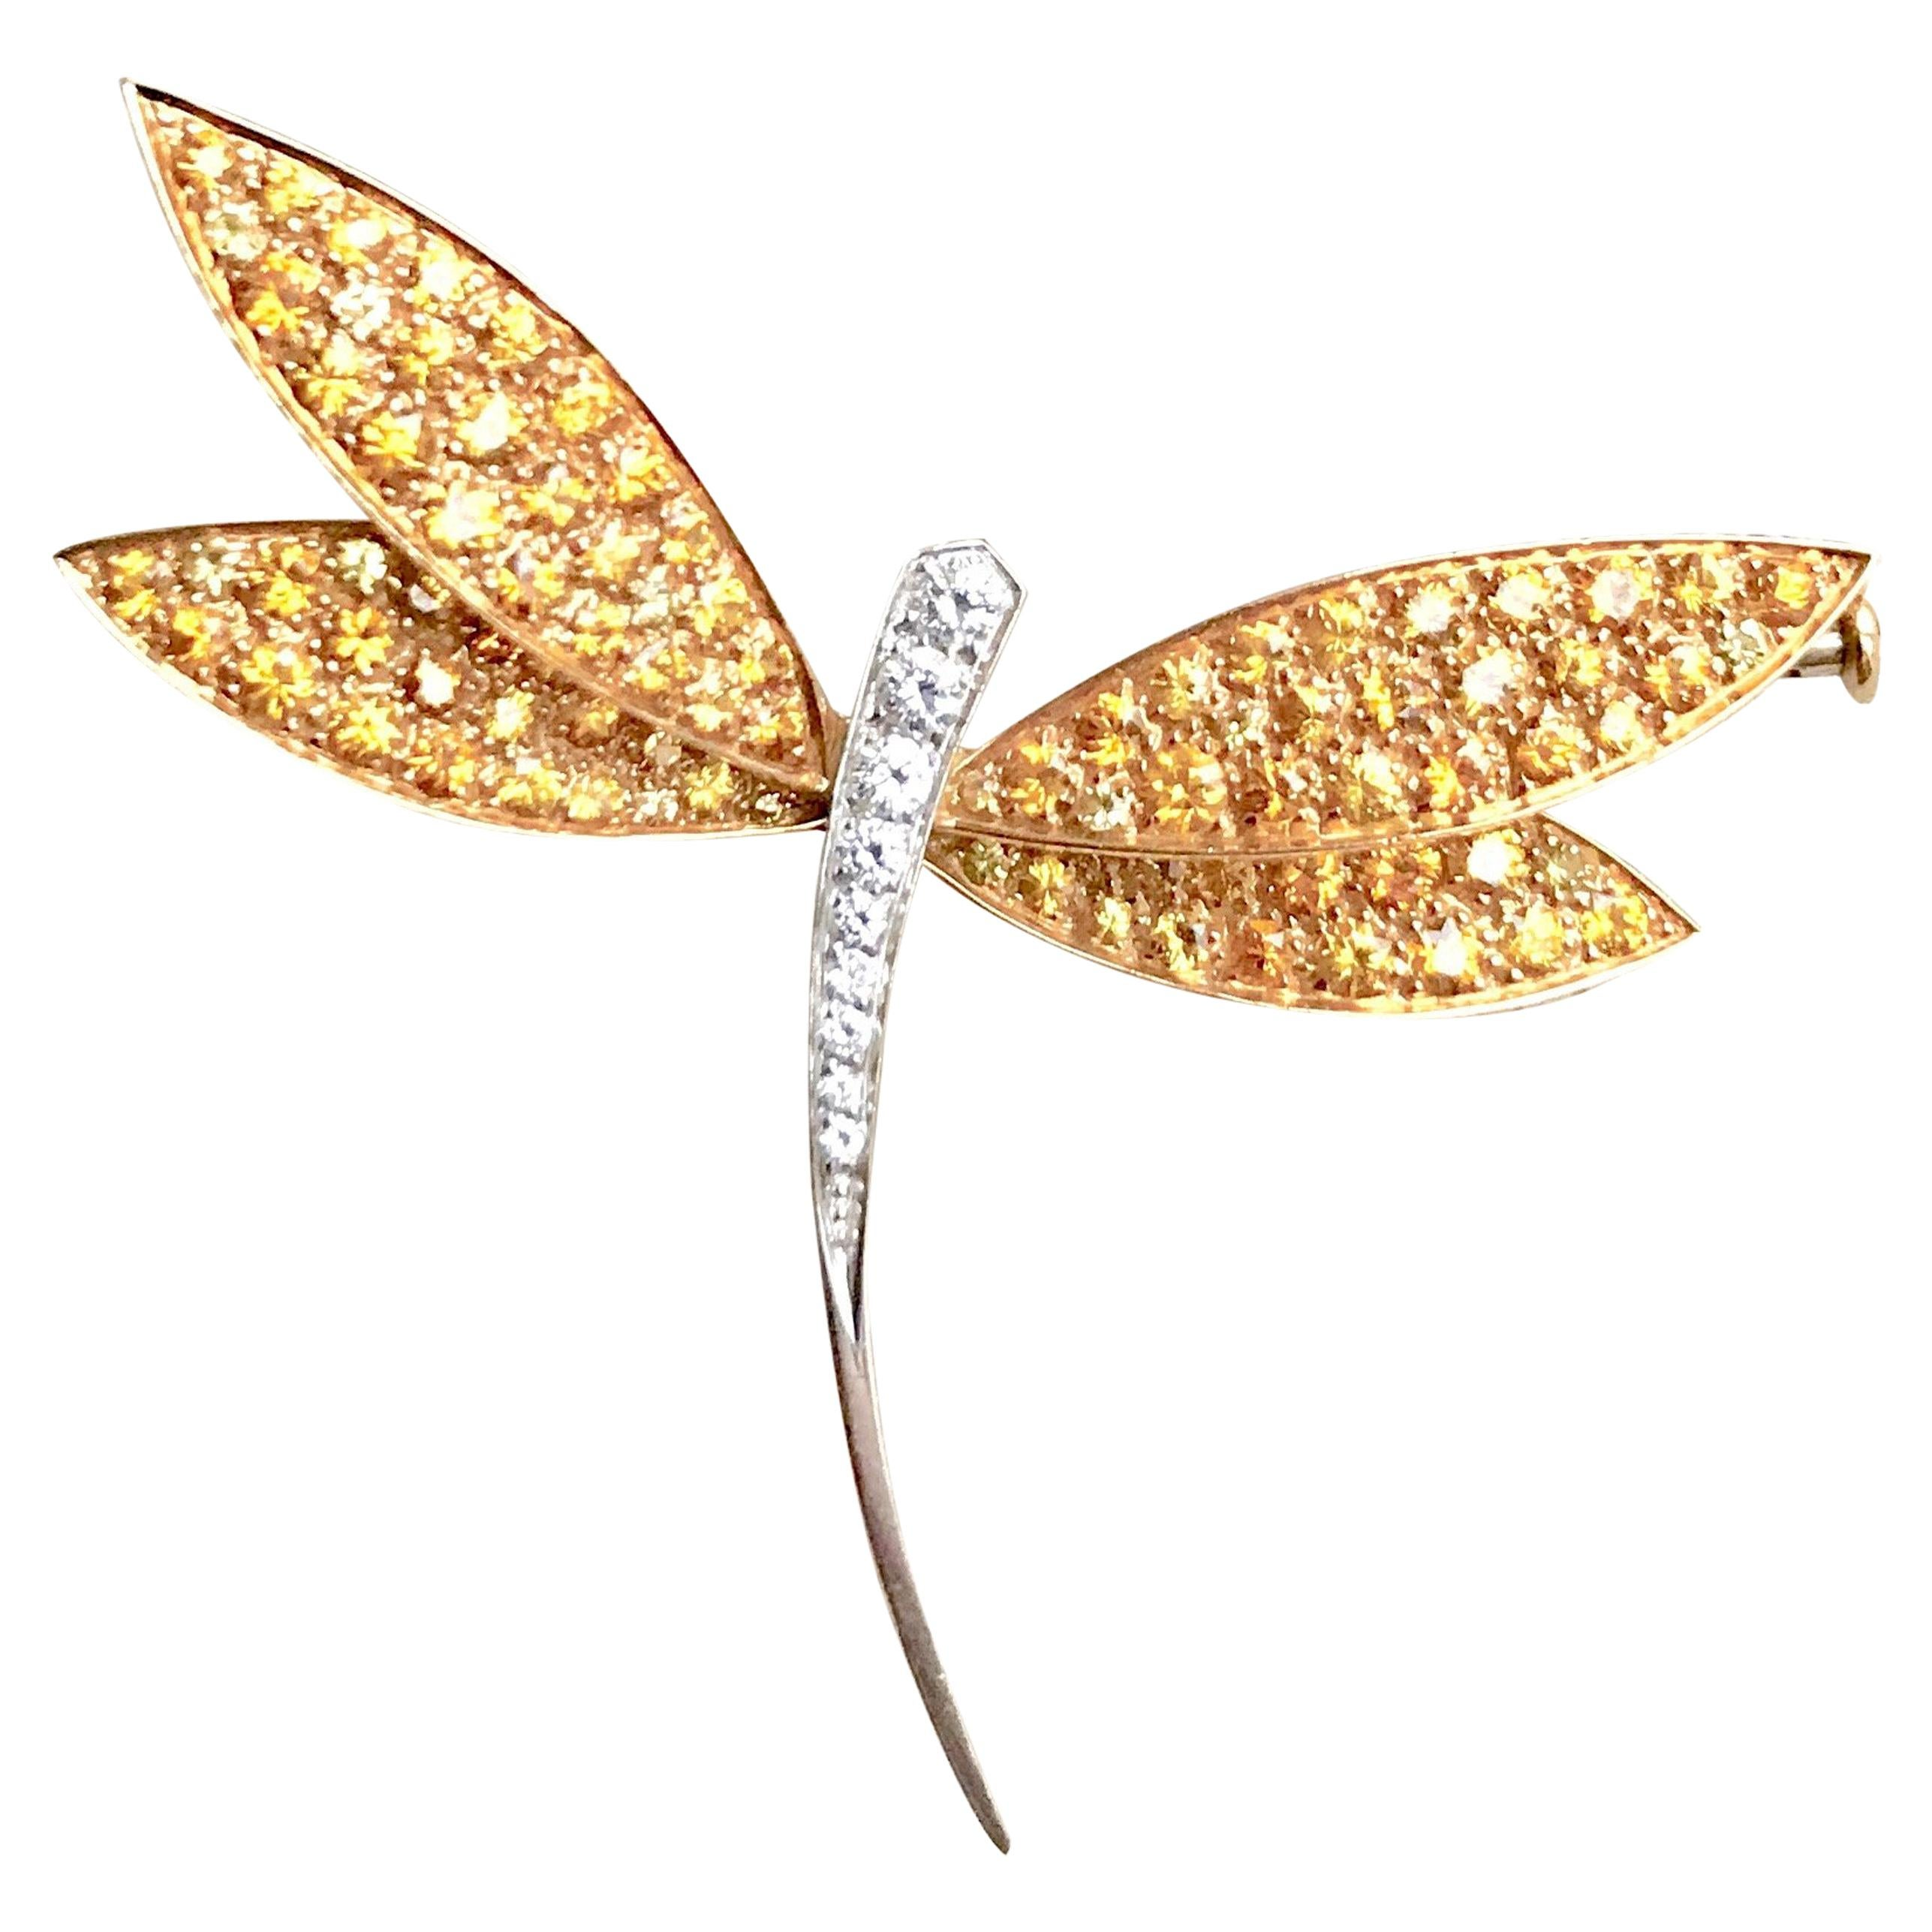 Van Cleef & Arpels Gold Dragonfly Brooch, Yellow Sapphires Diamonds